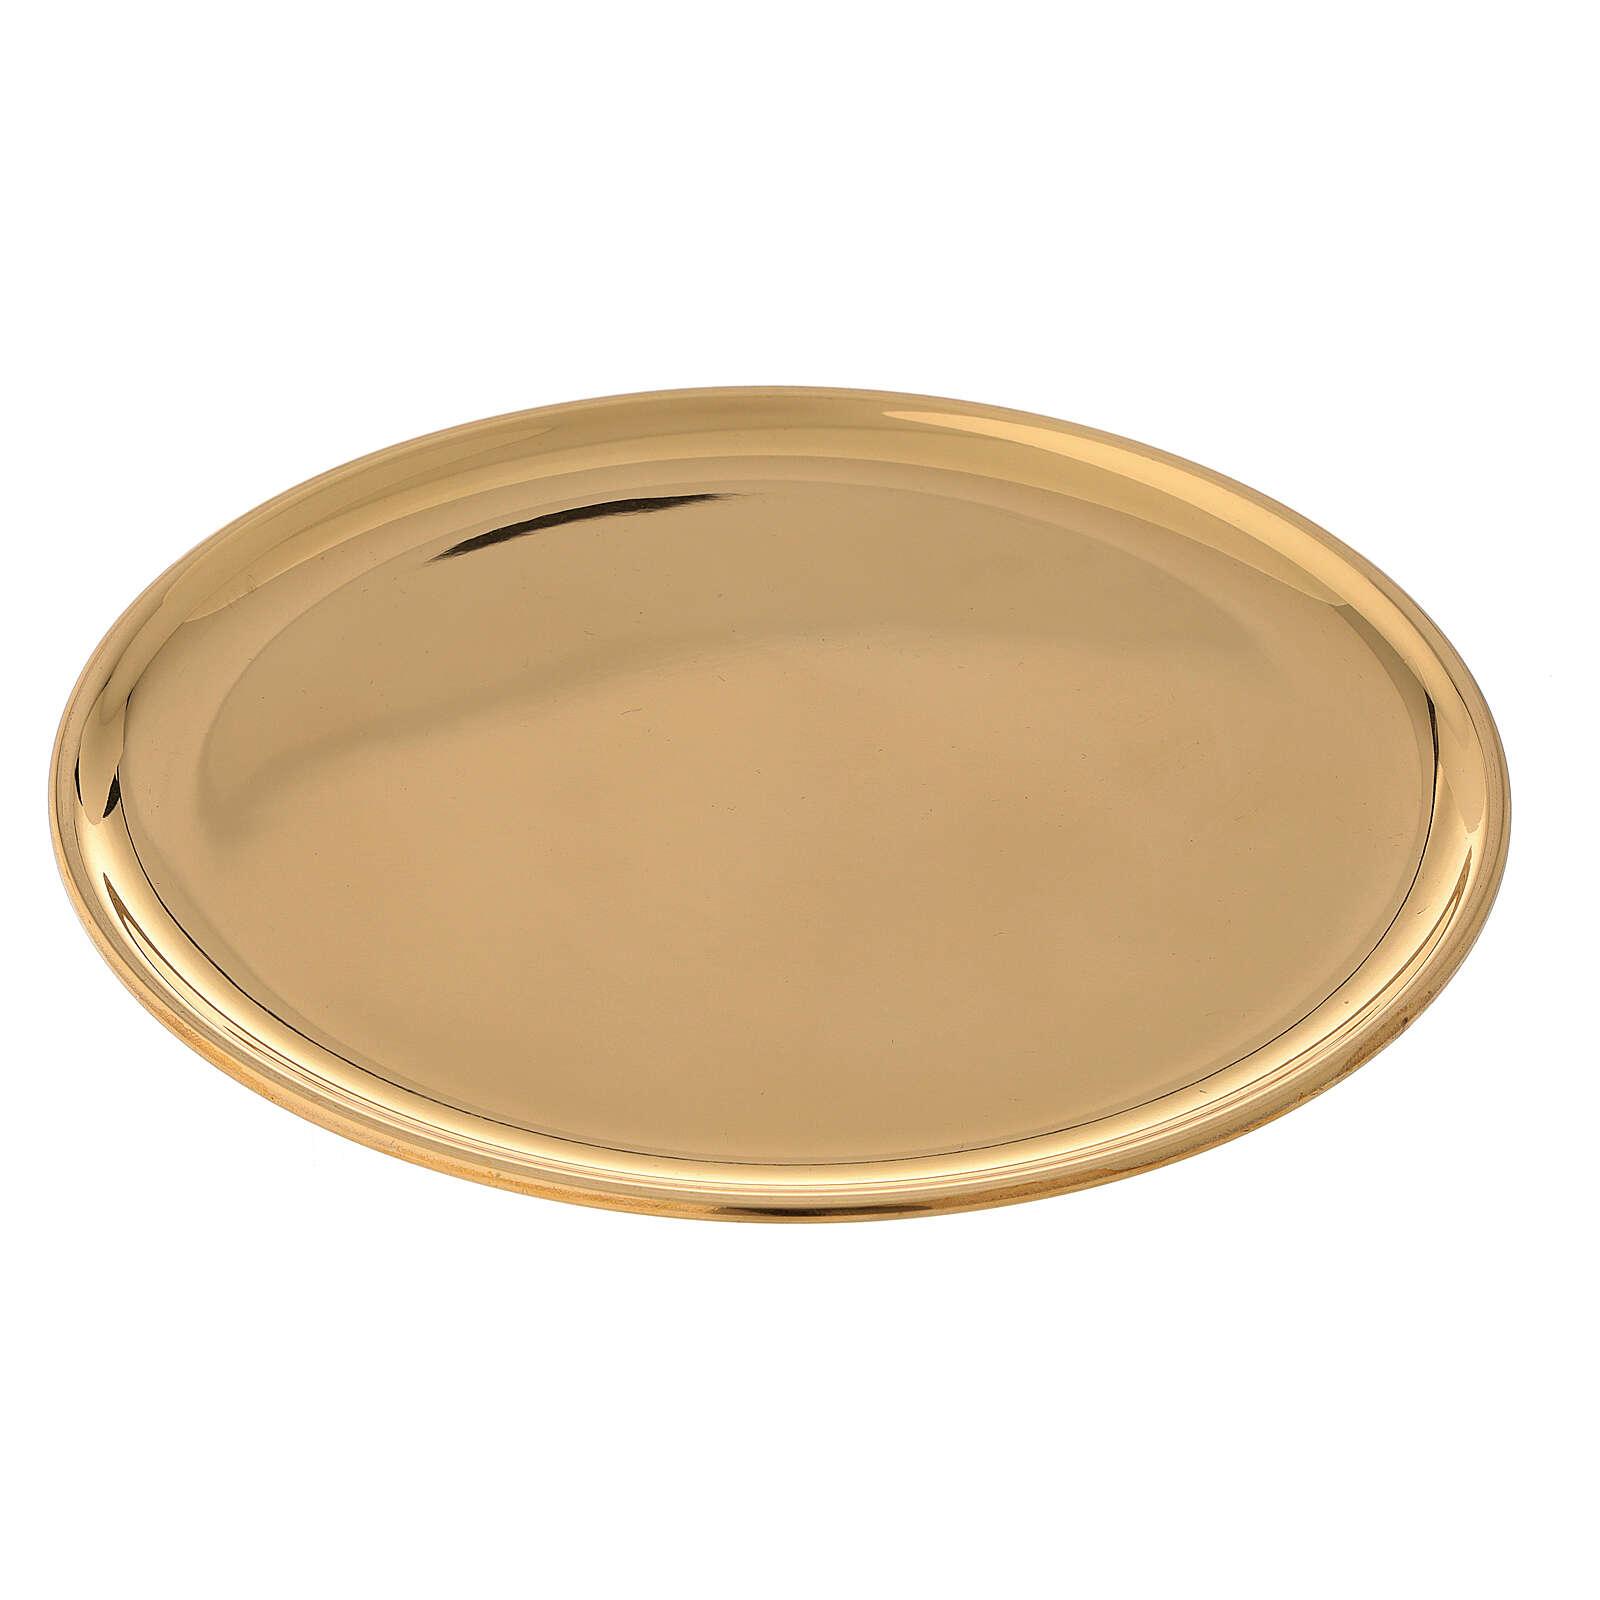 Plato velas diámetro 19 cm latón dorado lúcido 3